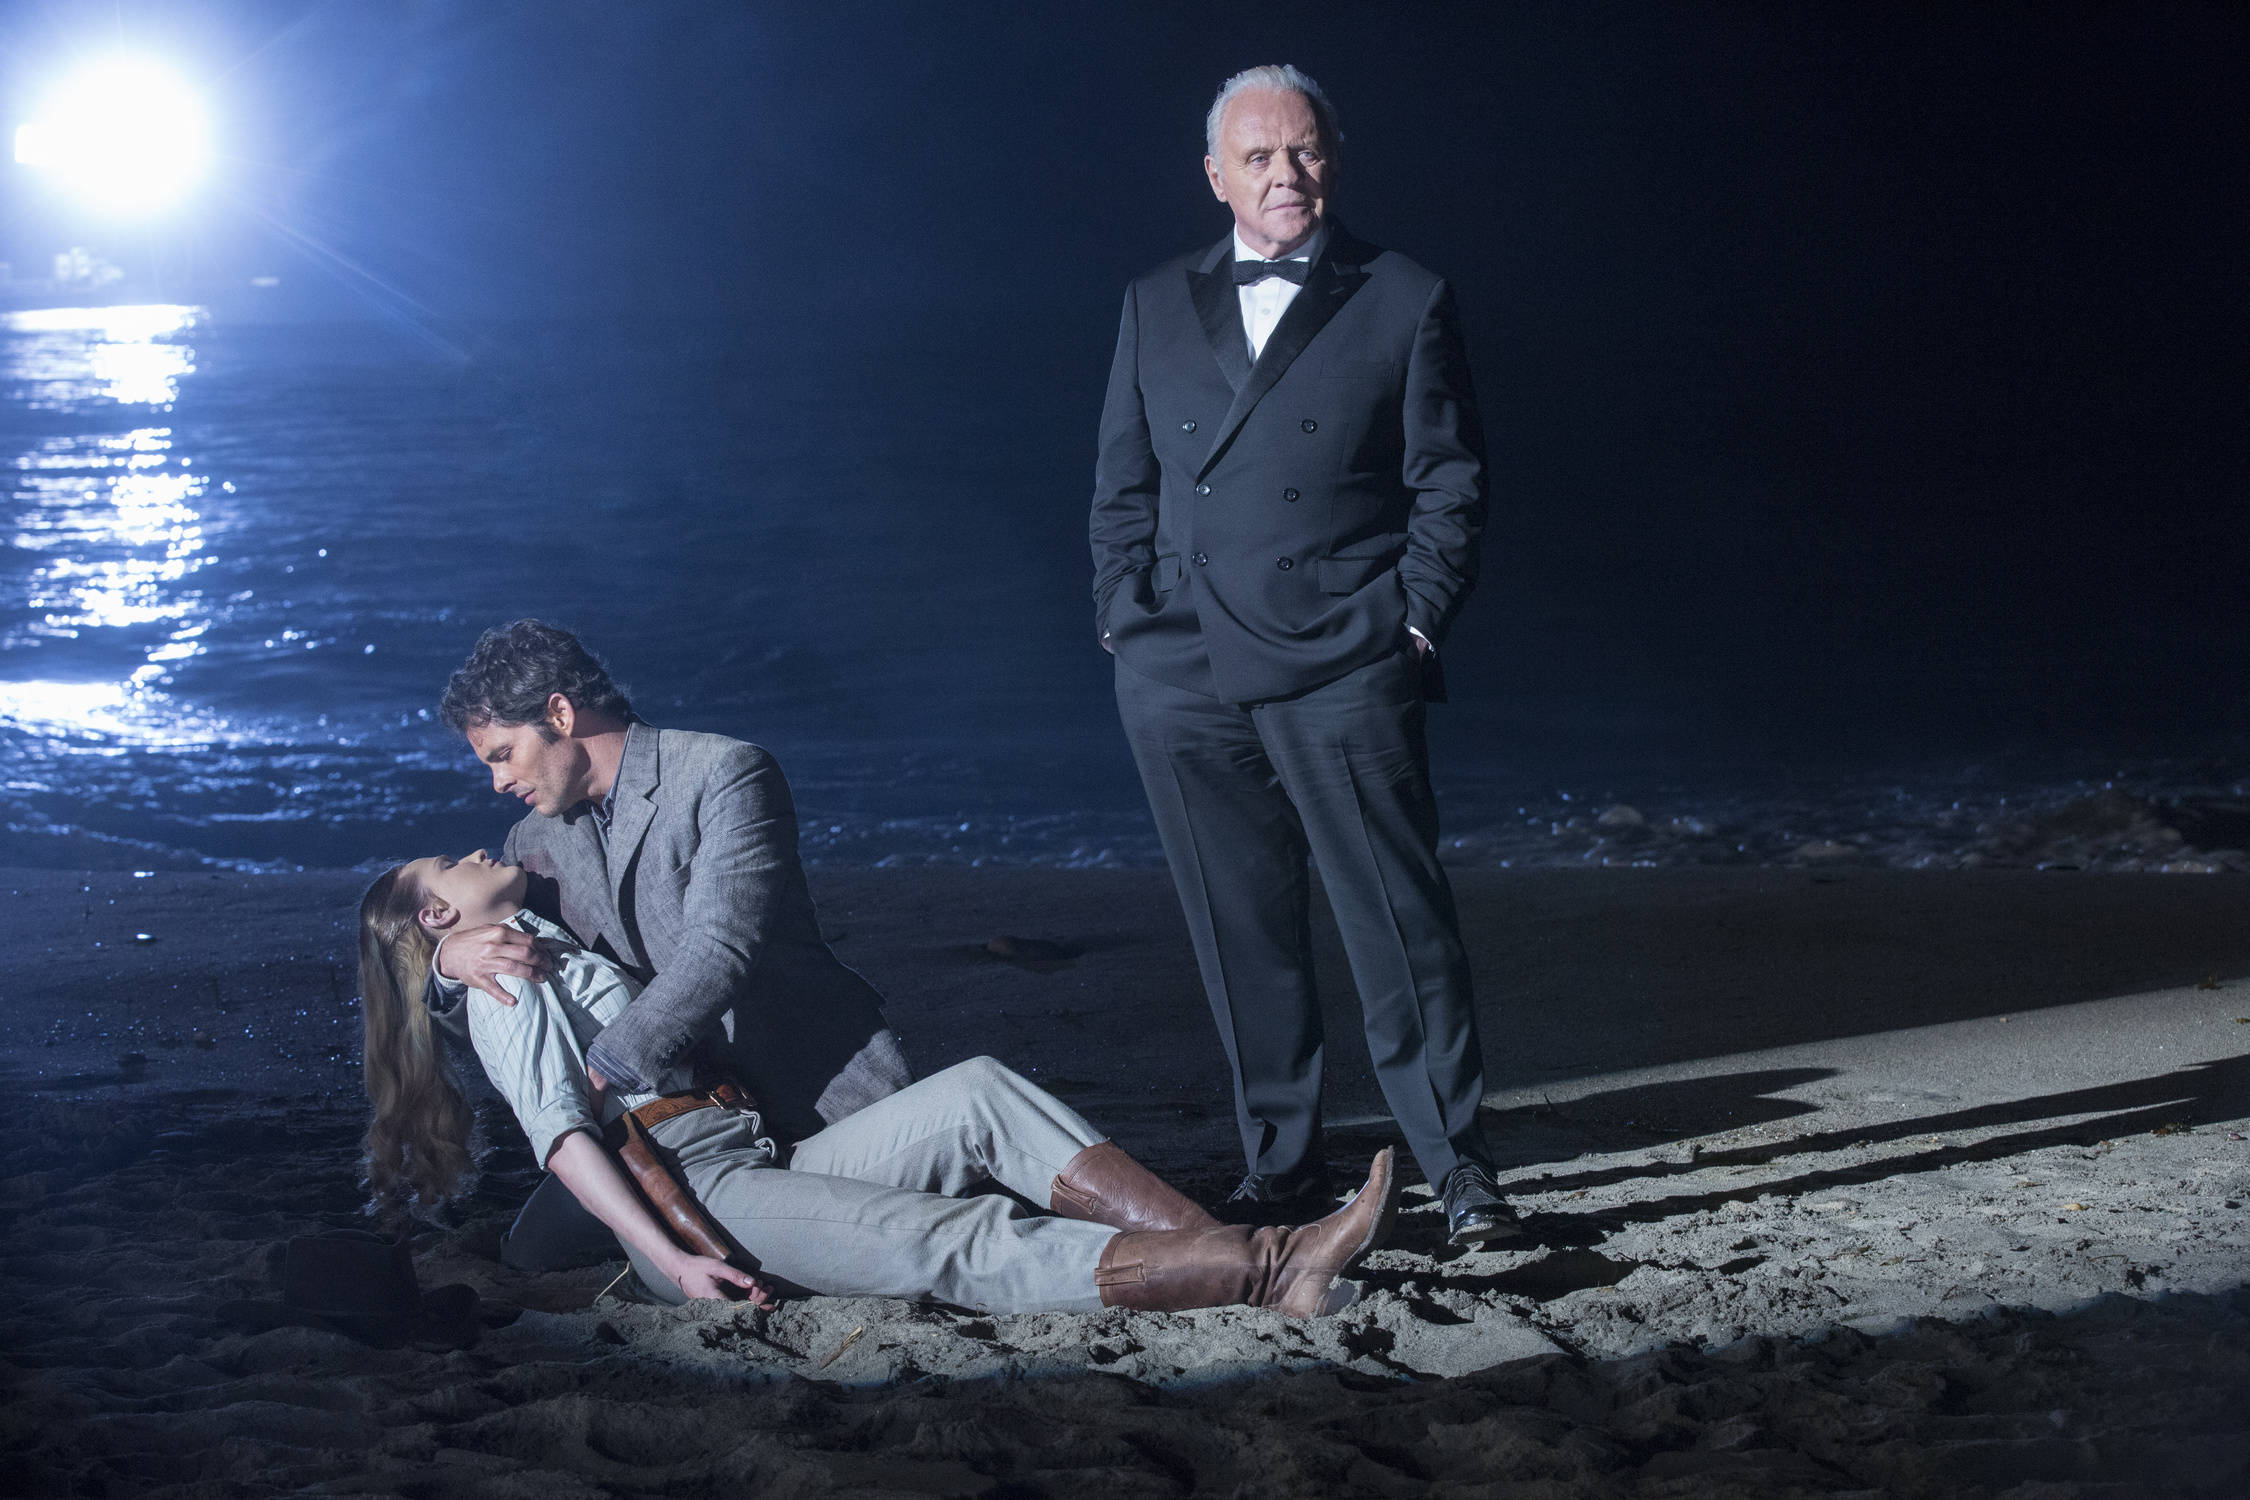 Evan Rachel Wood as Dolores, James Marsden as Teddy, Anthony Hopkins as